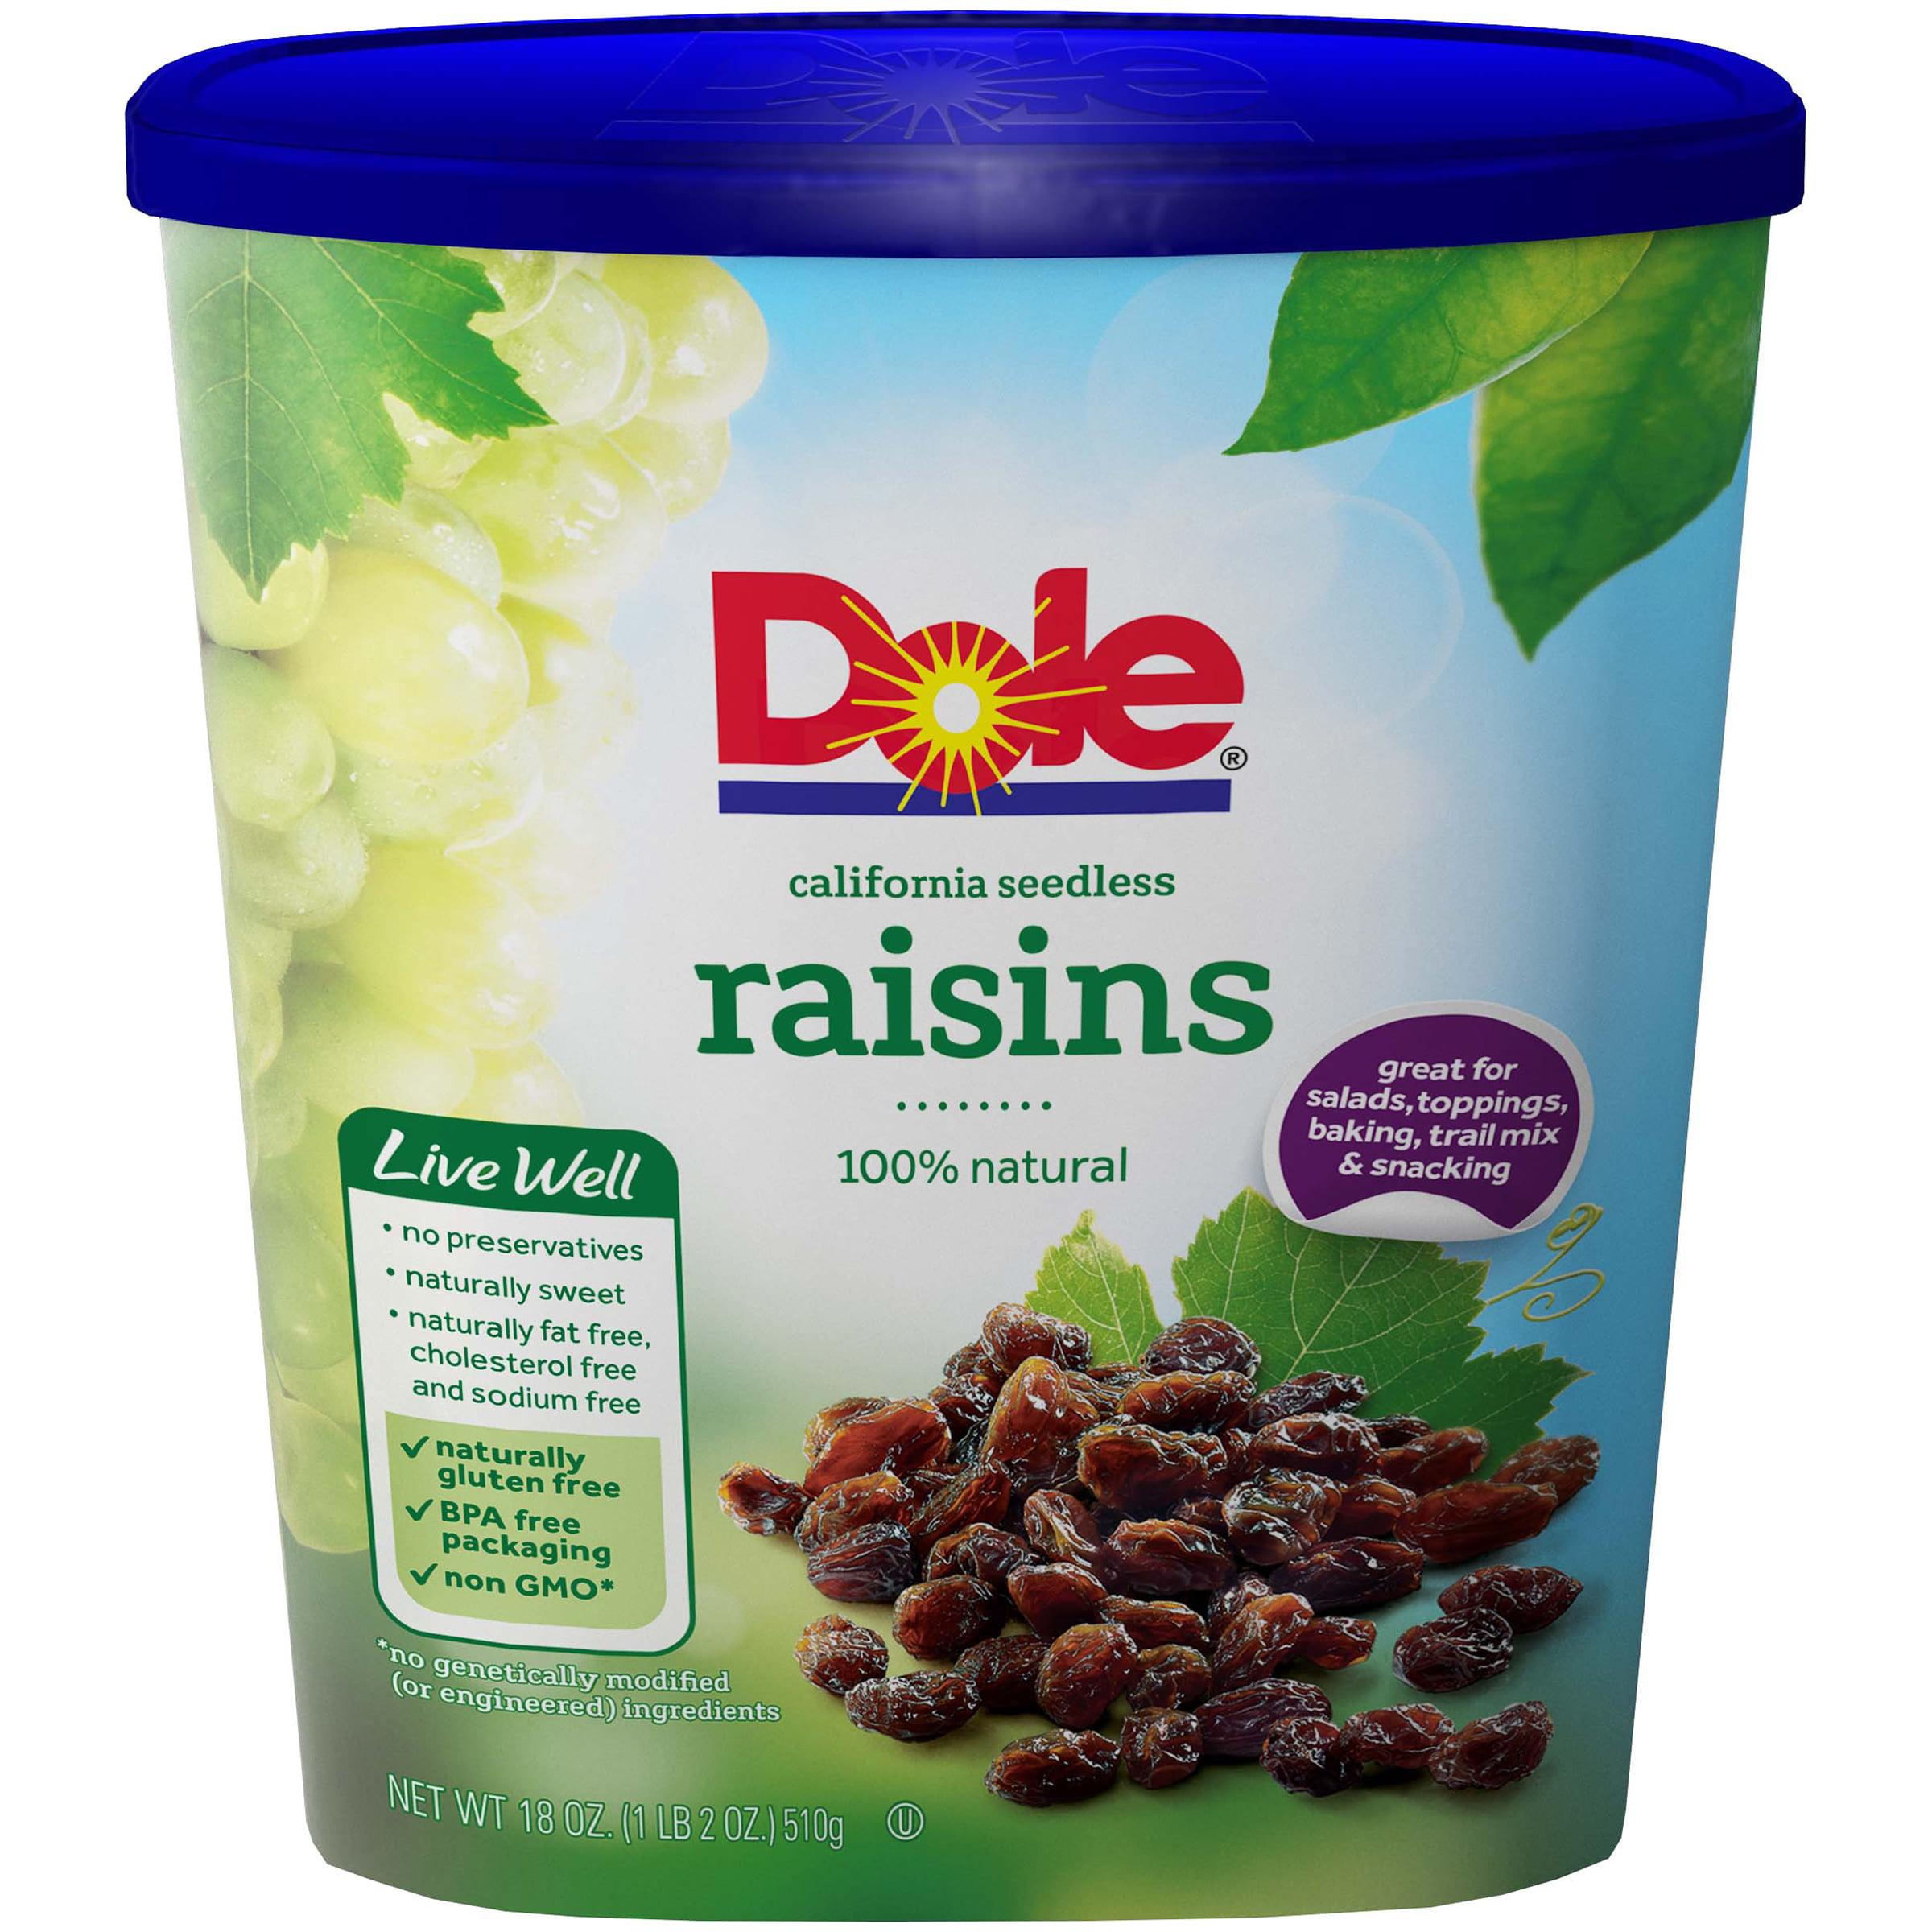 Dole California Seedless Raisins 18 oz. Canister